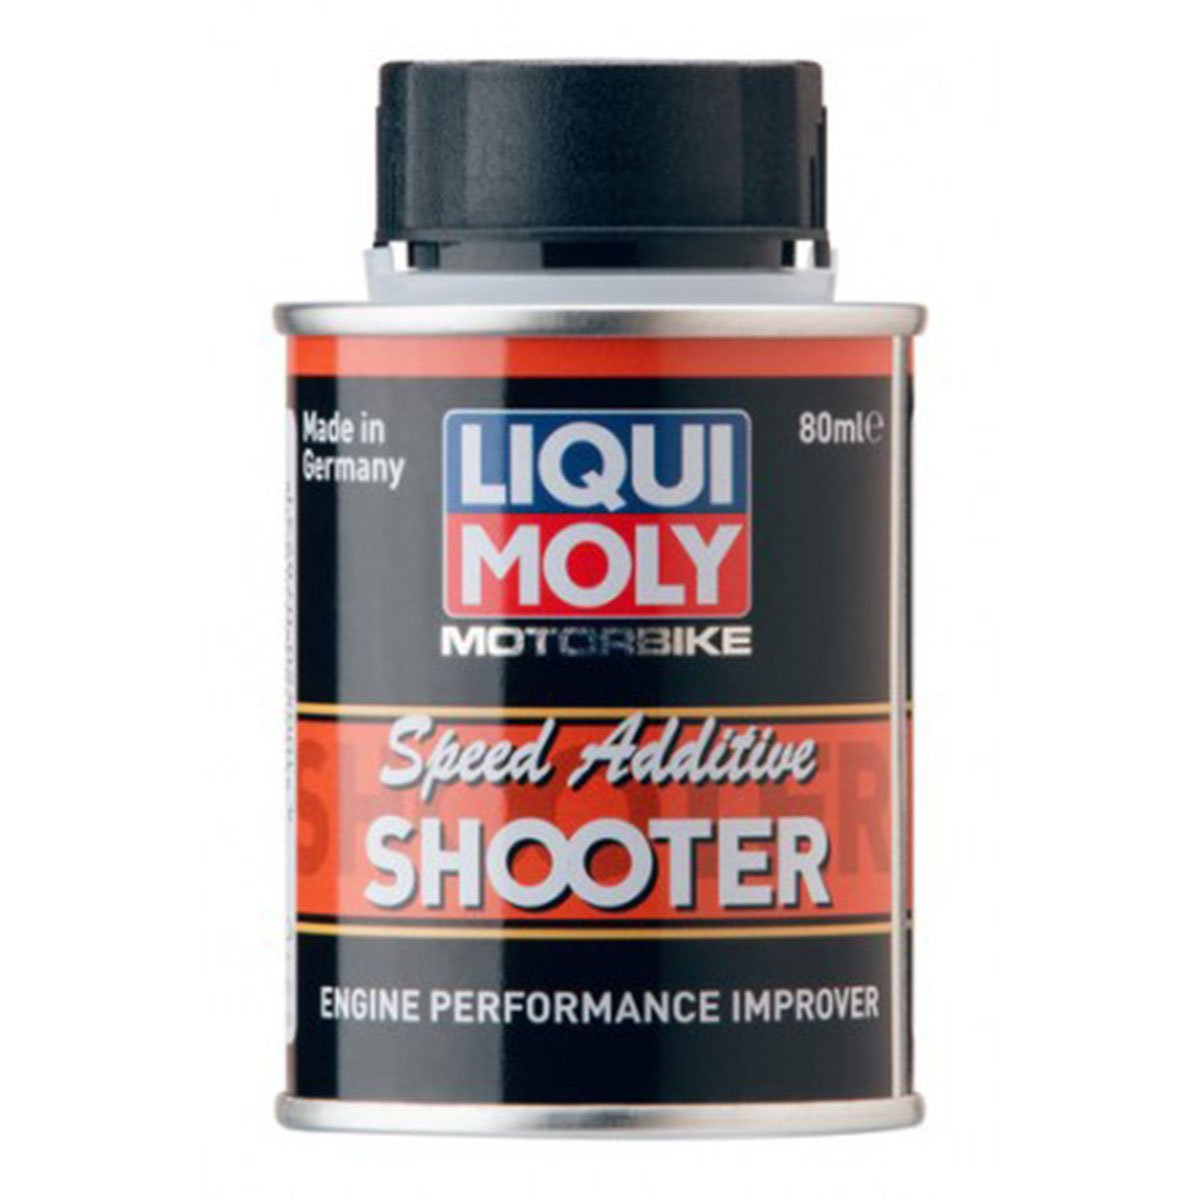 Liqui Moly Motorbike Speed Additive Shooter 80ML